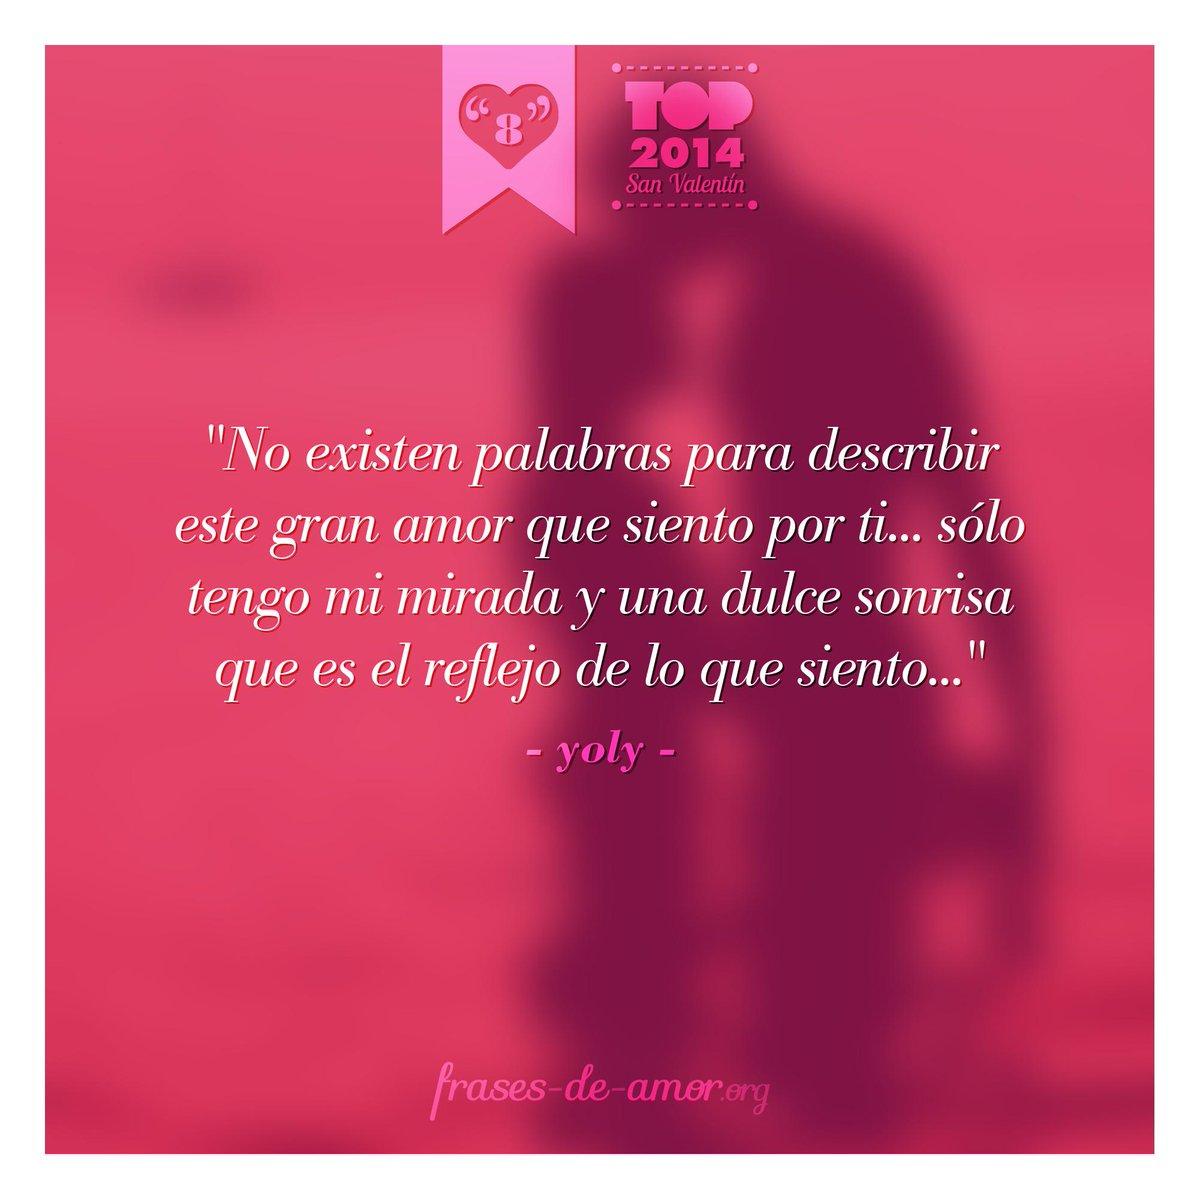 Frases De Amor On Twitter Top 2014 Especial Sanvalentin